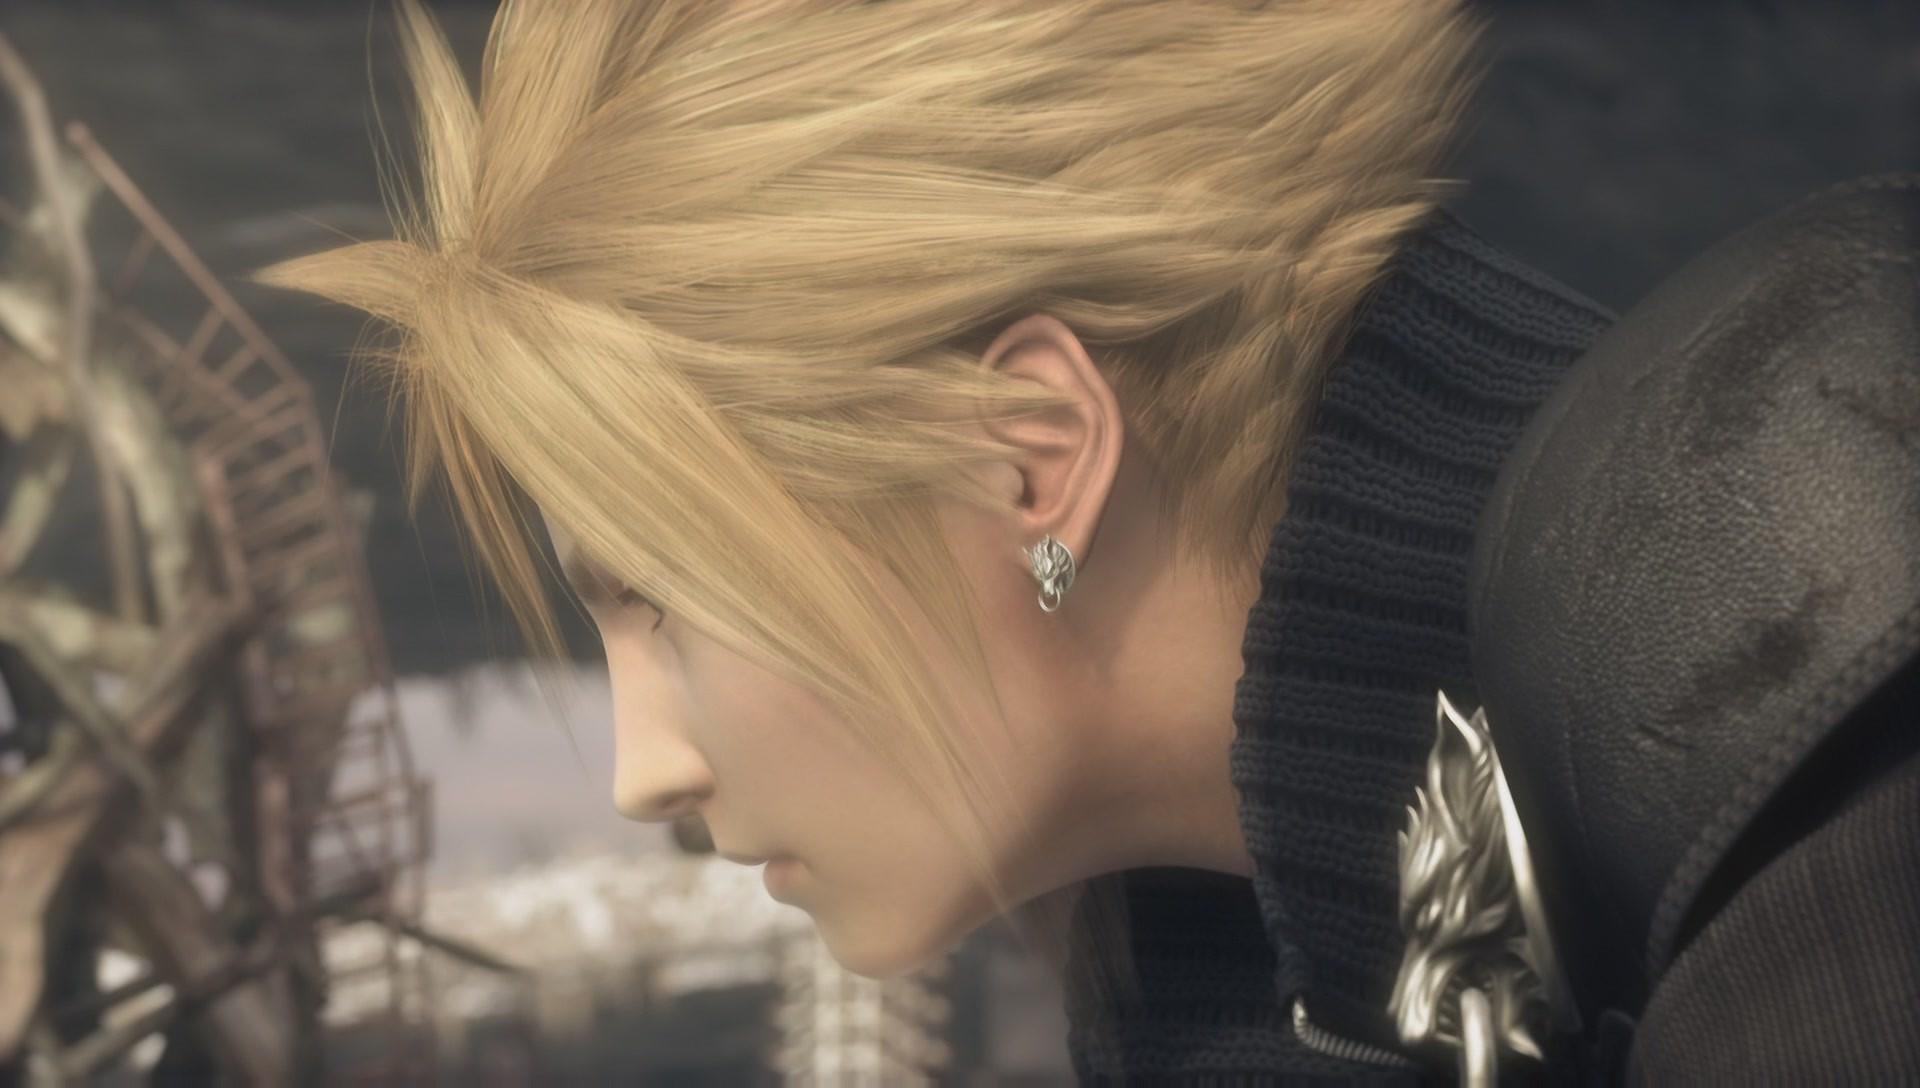 Final Fantasy Vii Advent Children Hd Wallpaper Background Image